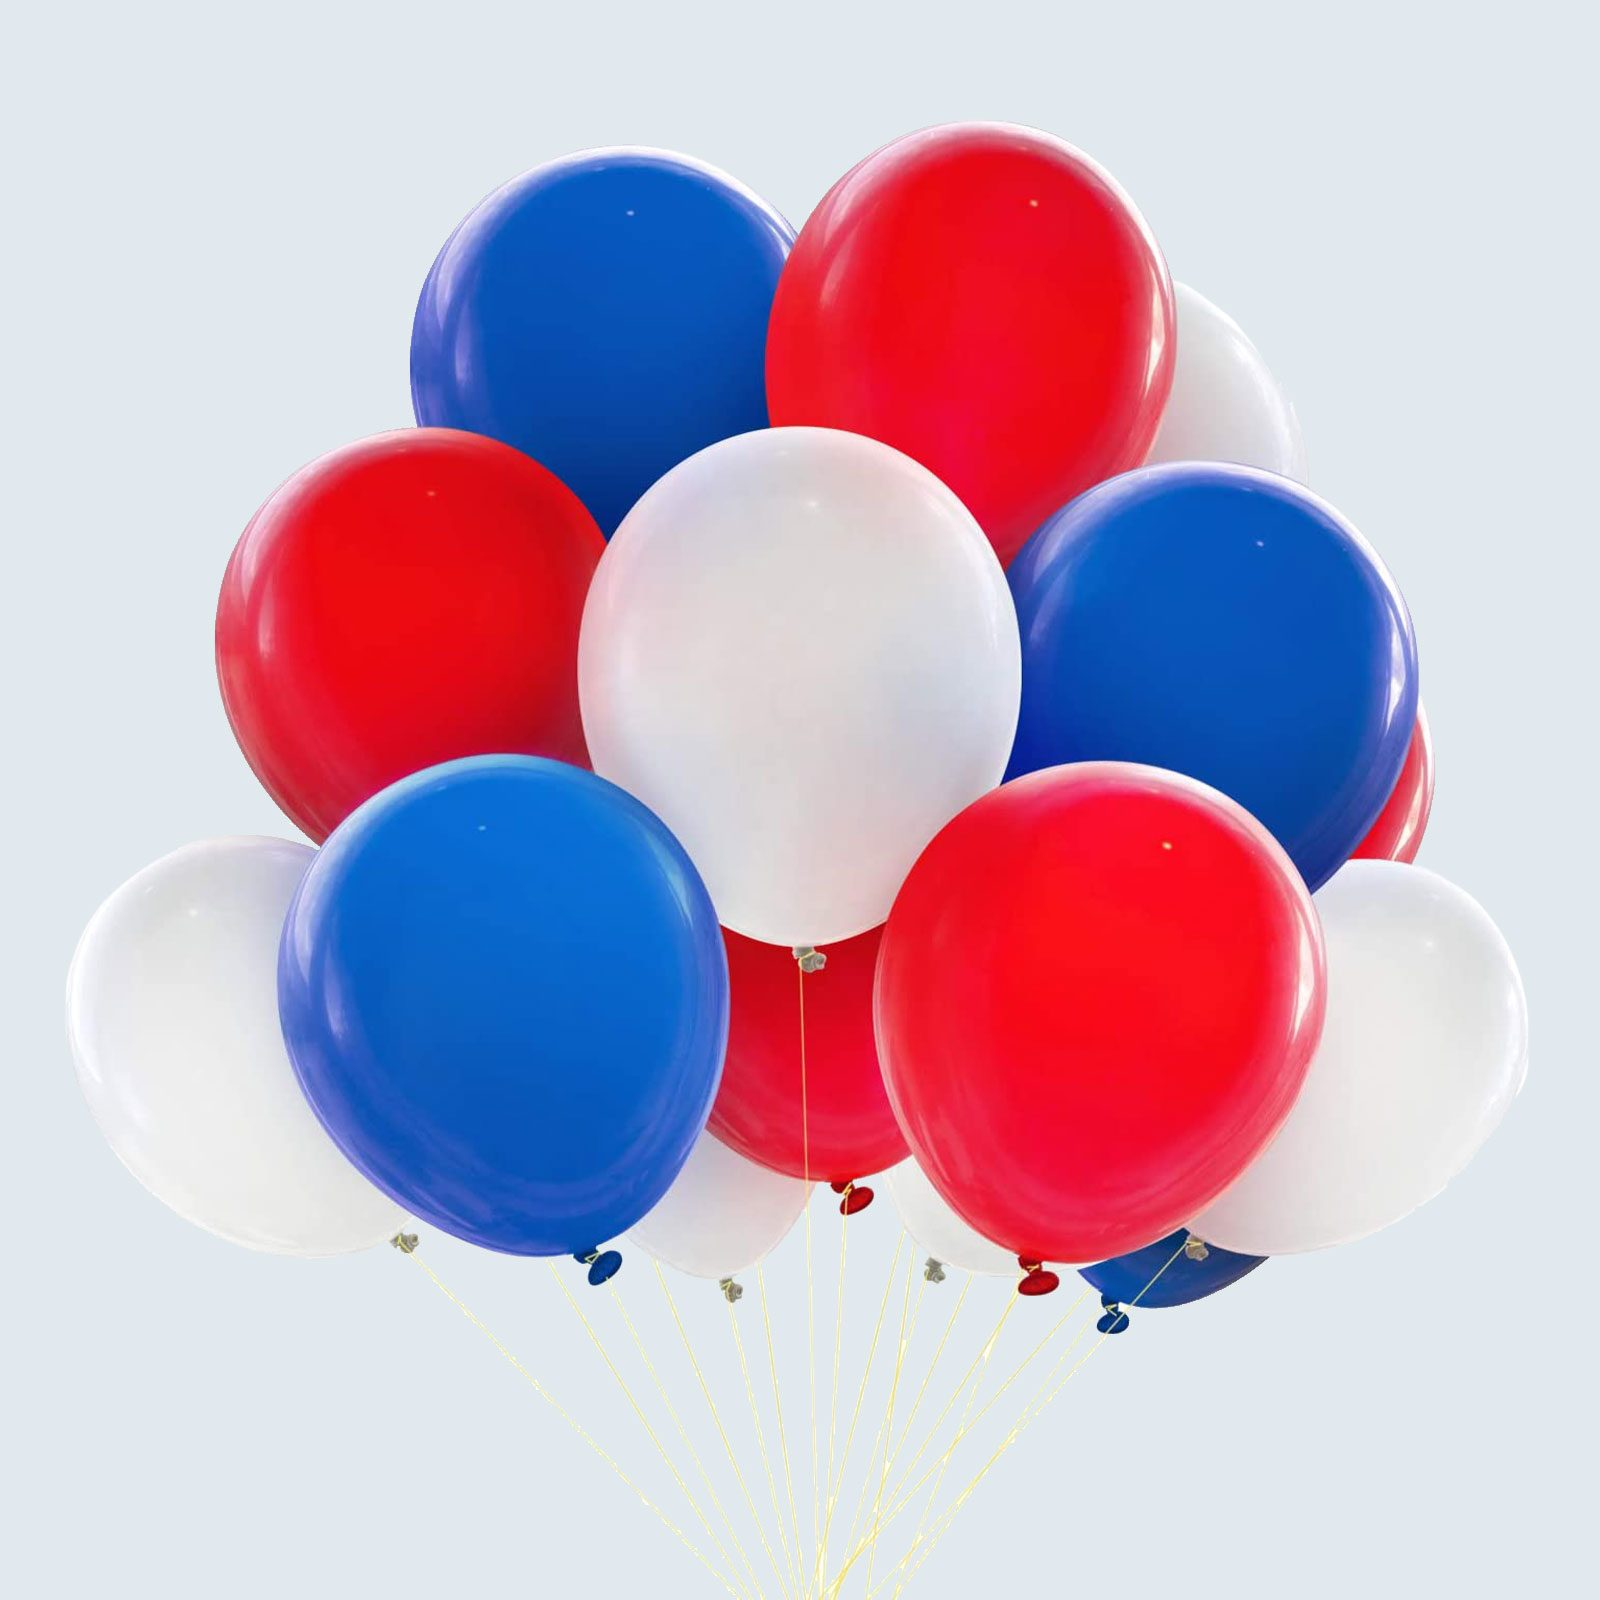 Patriotic Decoration Balloons